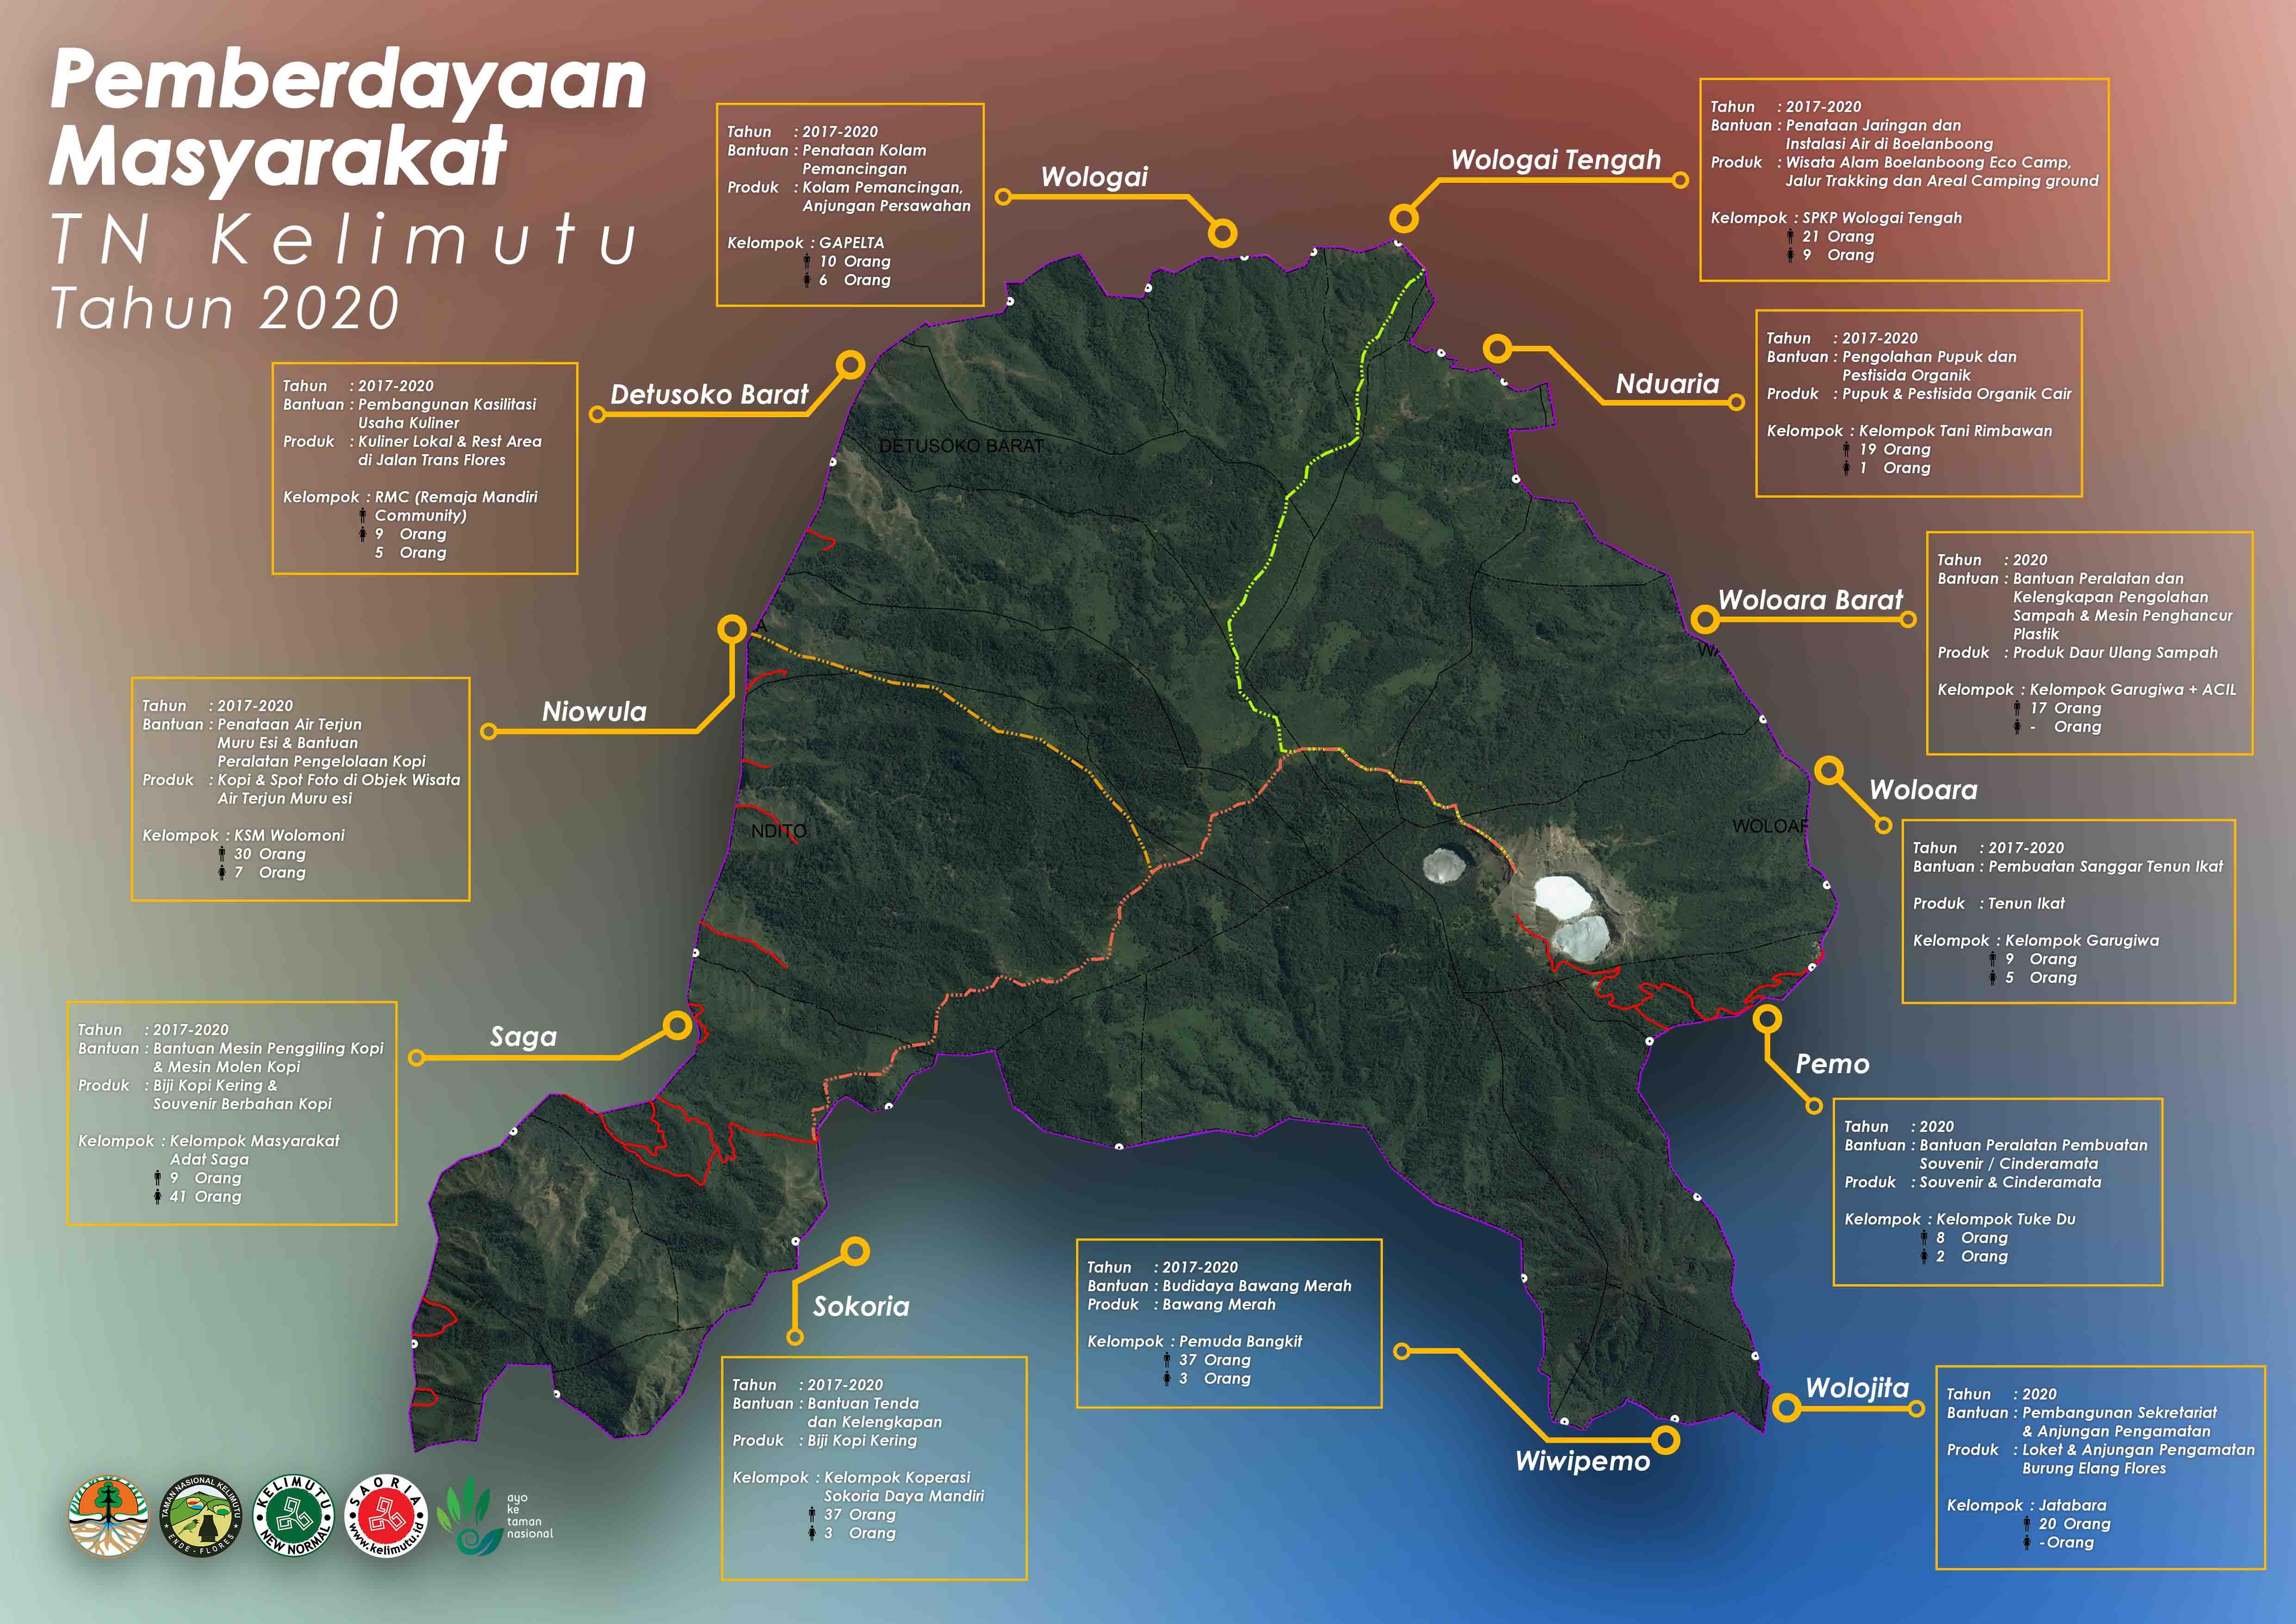 Infografis Pemberdayaan Masyarakat TN Kelimutu